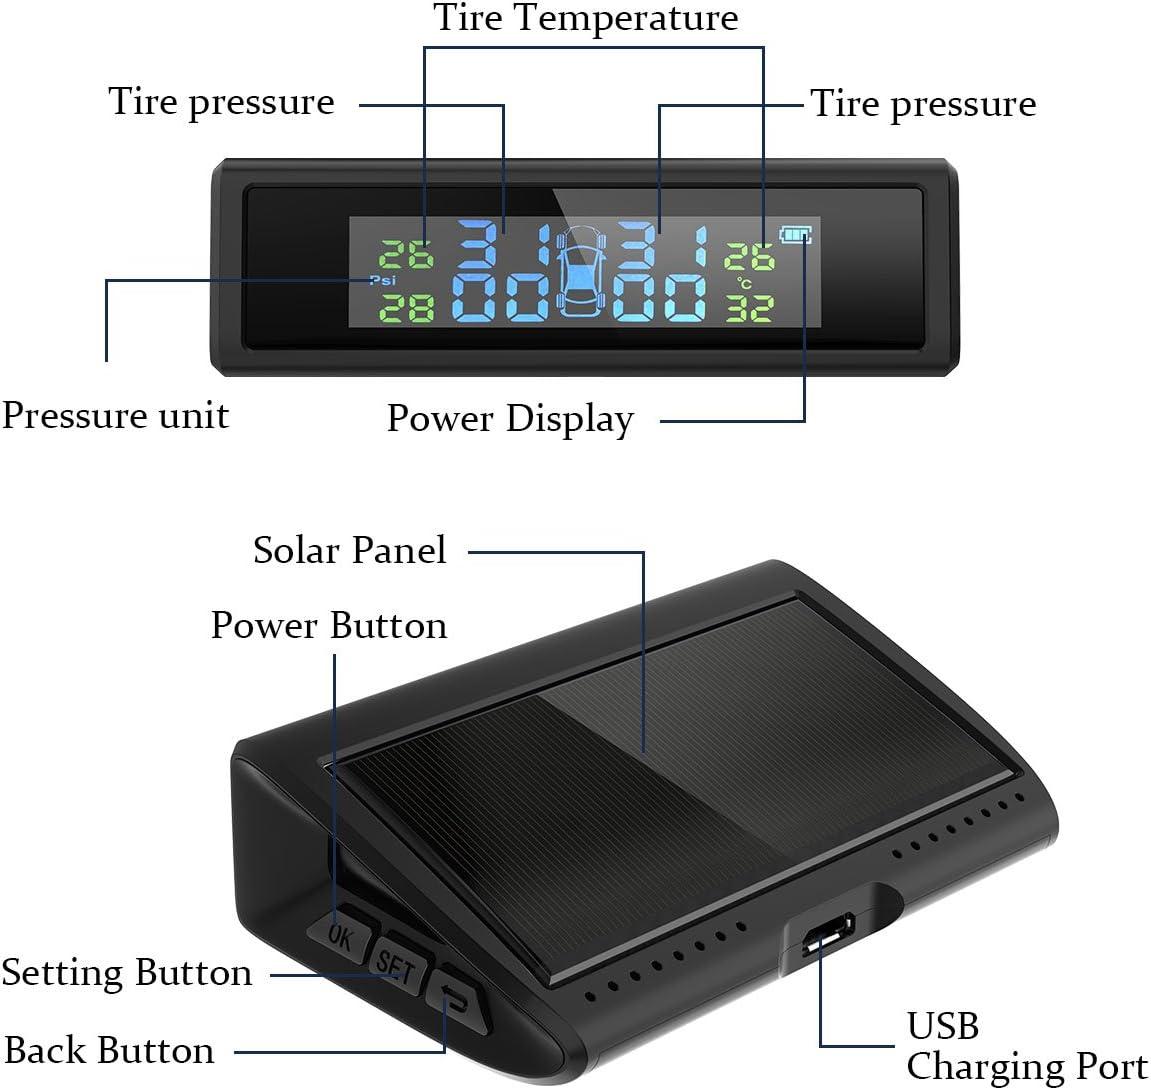 Keenso 4pcs Car TPMS Sensor Tire Pressure Monitoring System Tire Pressure Sensor for Mercedes Benz Renault Dacia Dokker Smart Fortwo Nissan NV400 X62